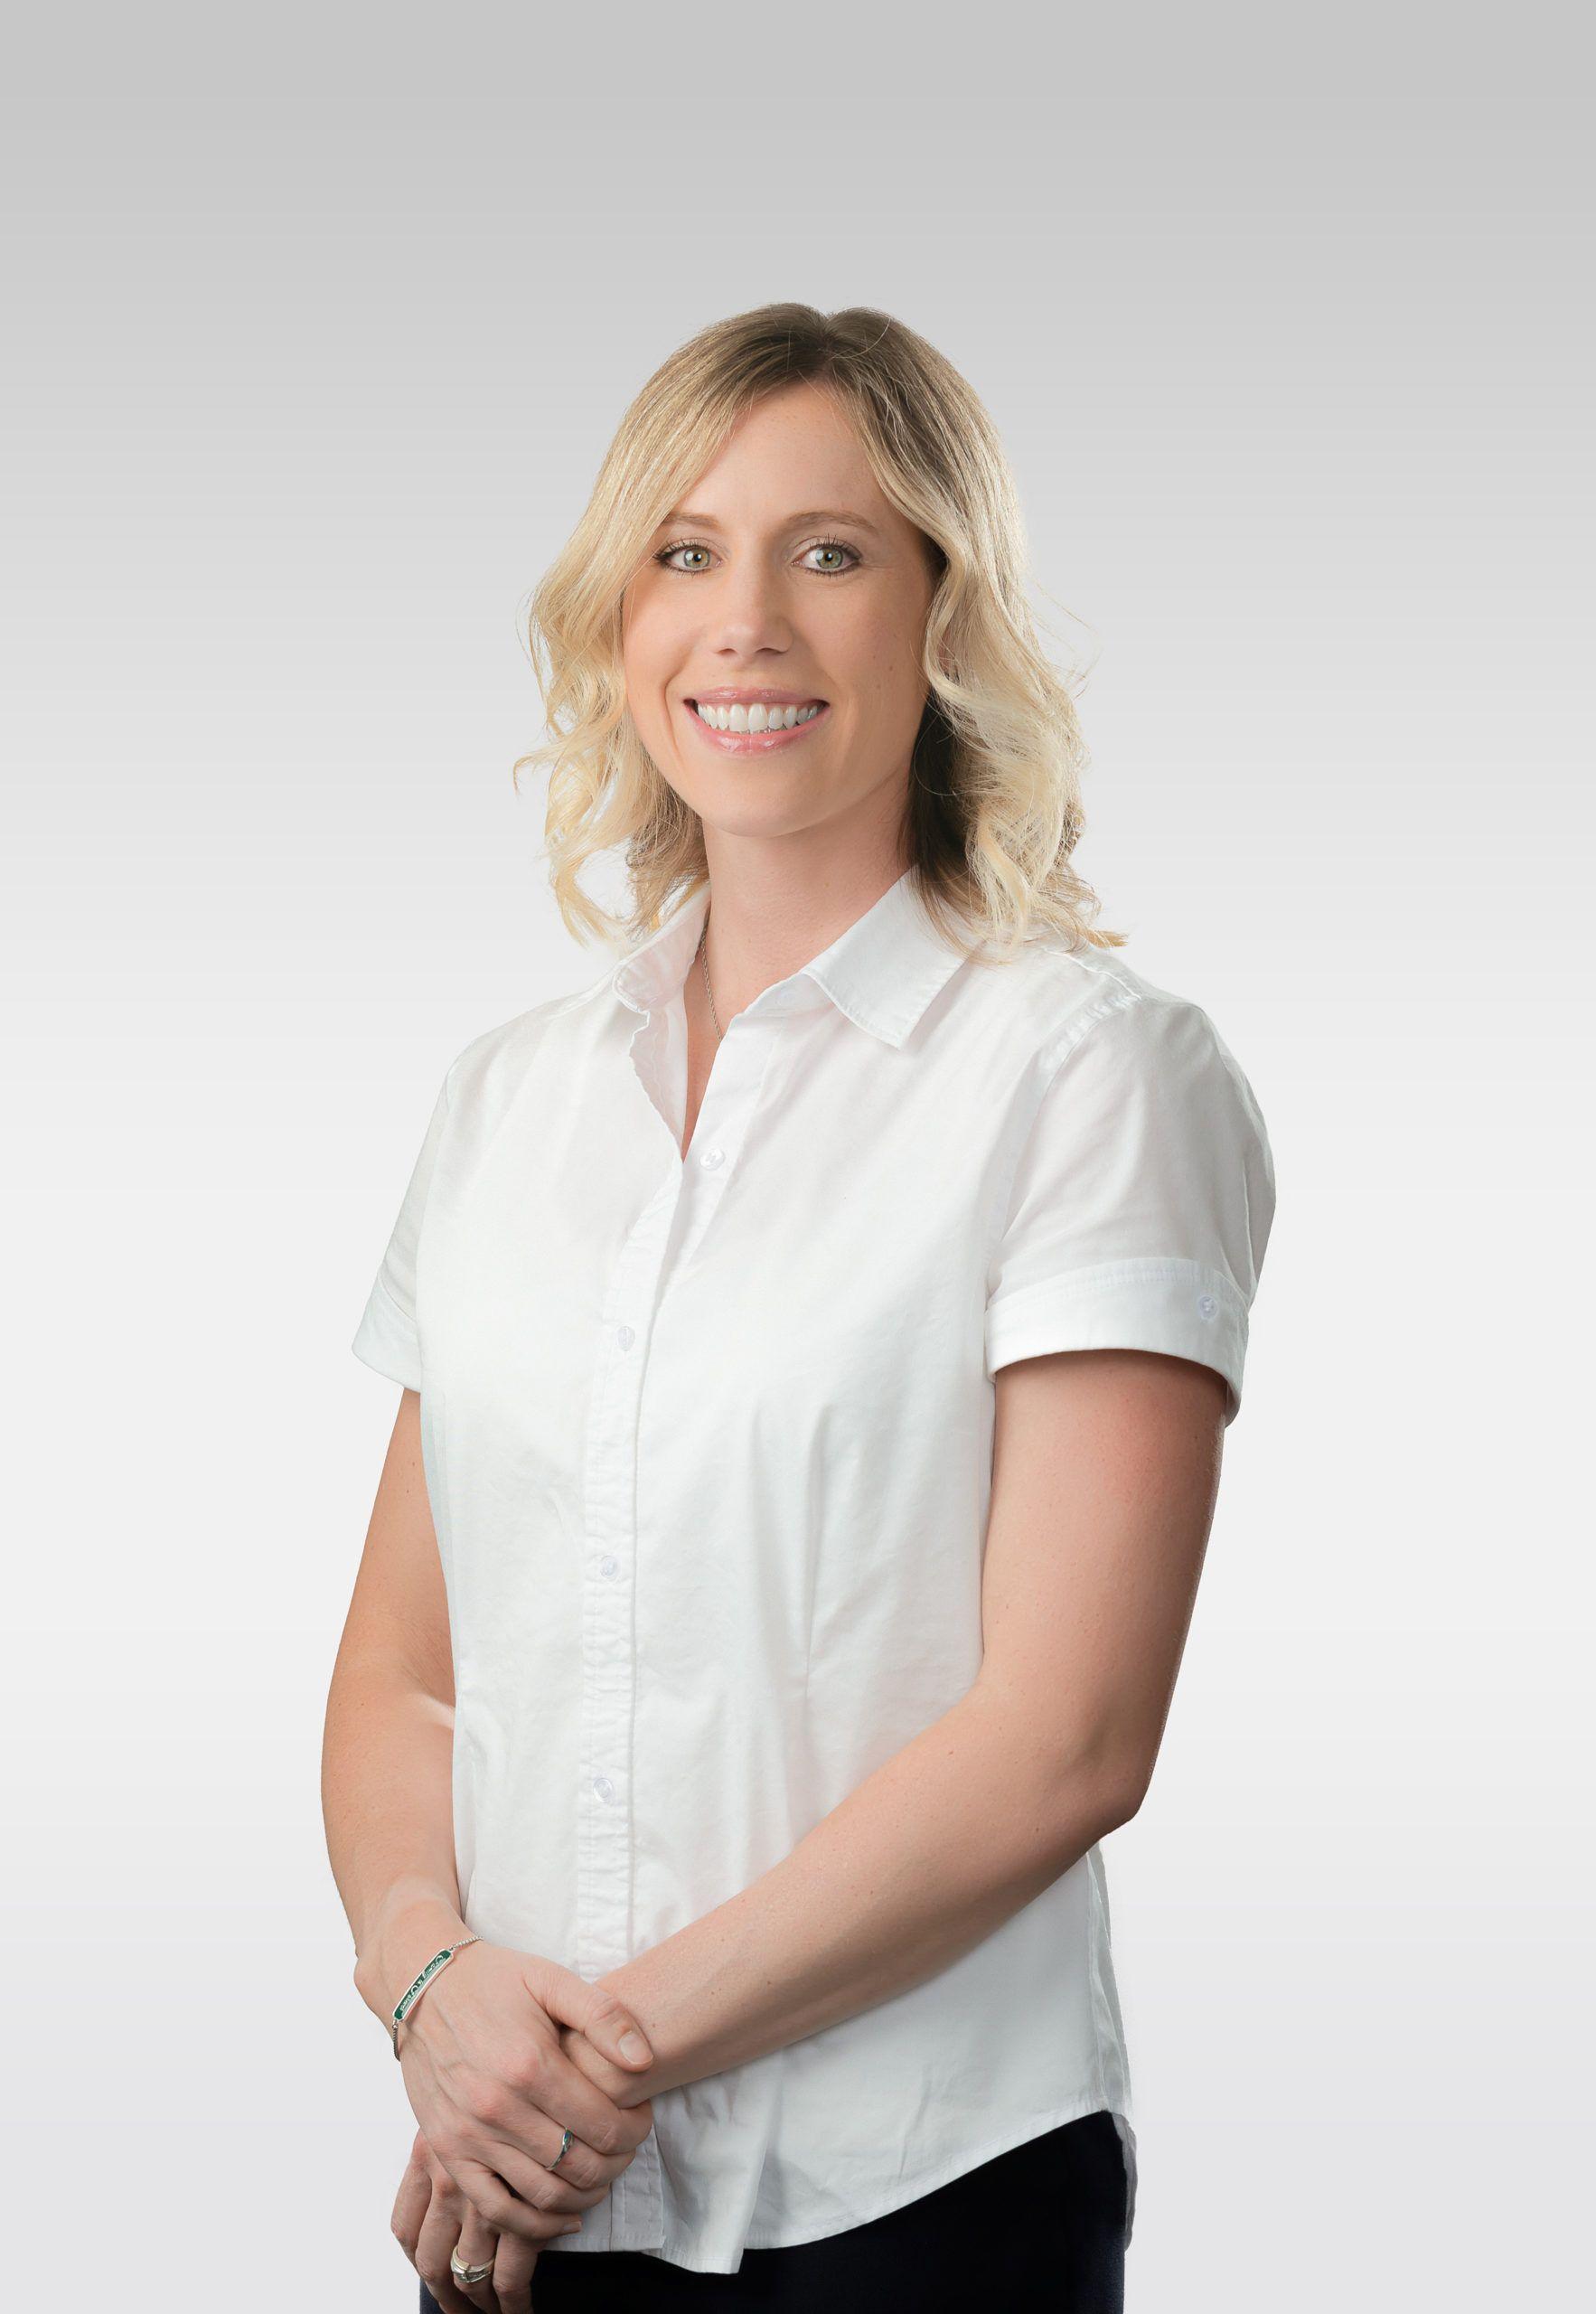 Haley Scellick